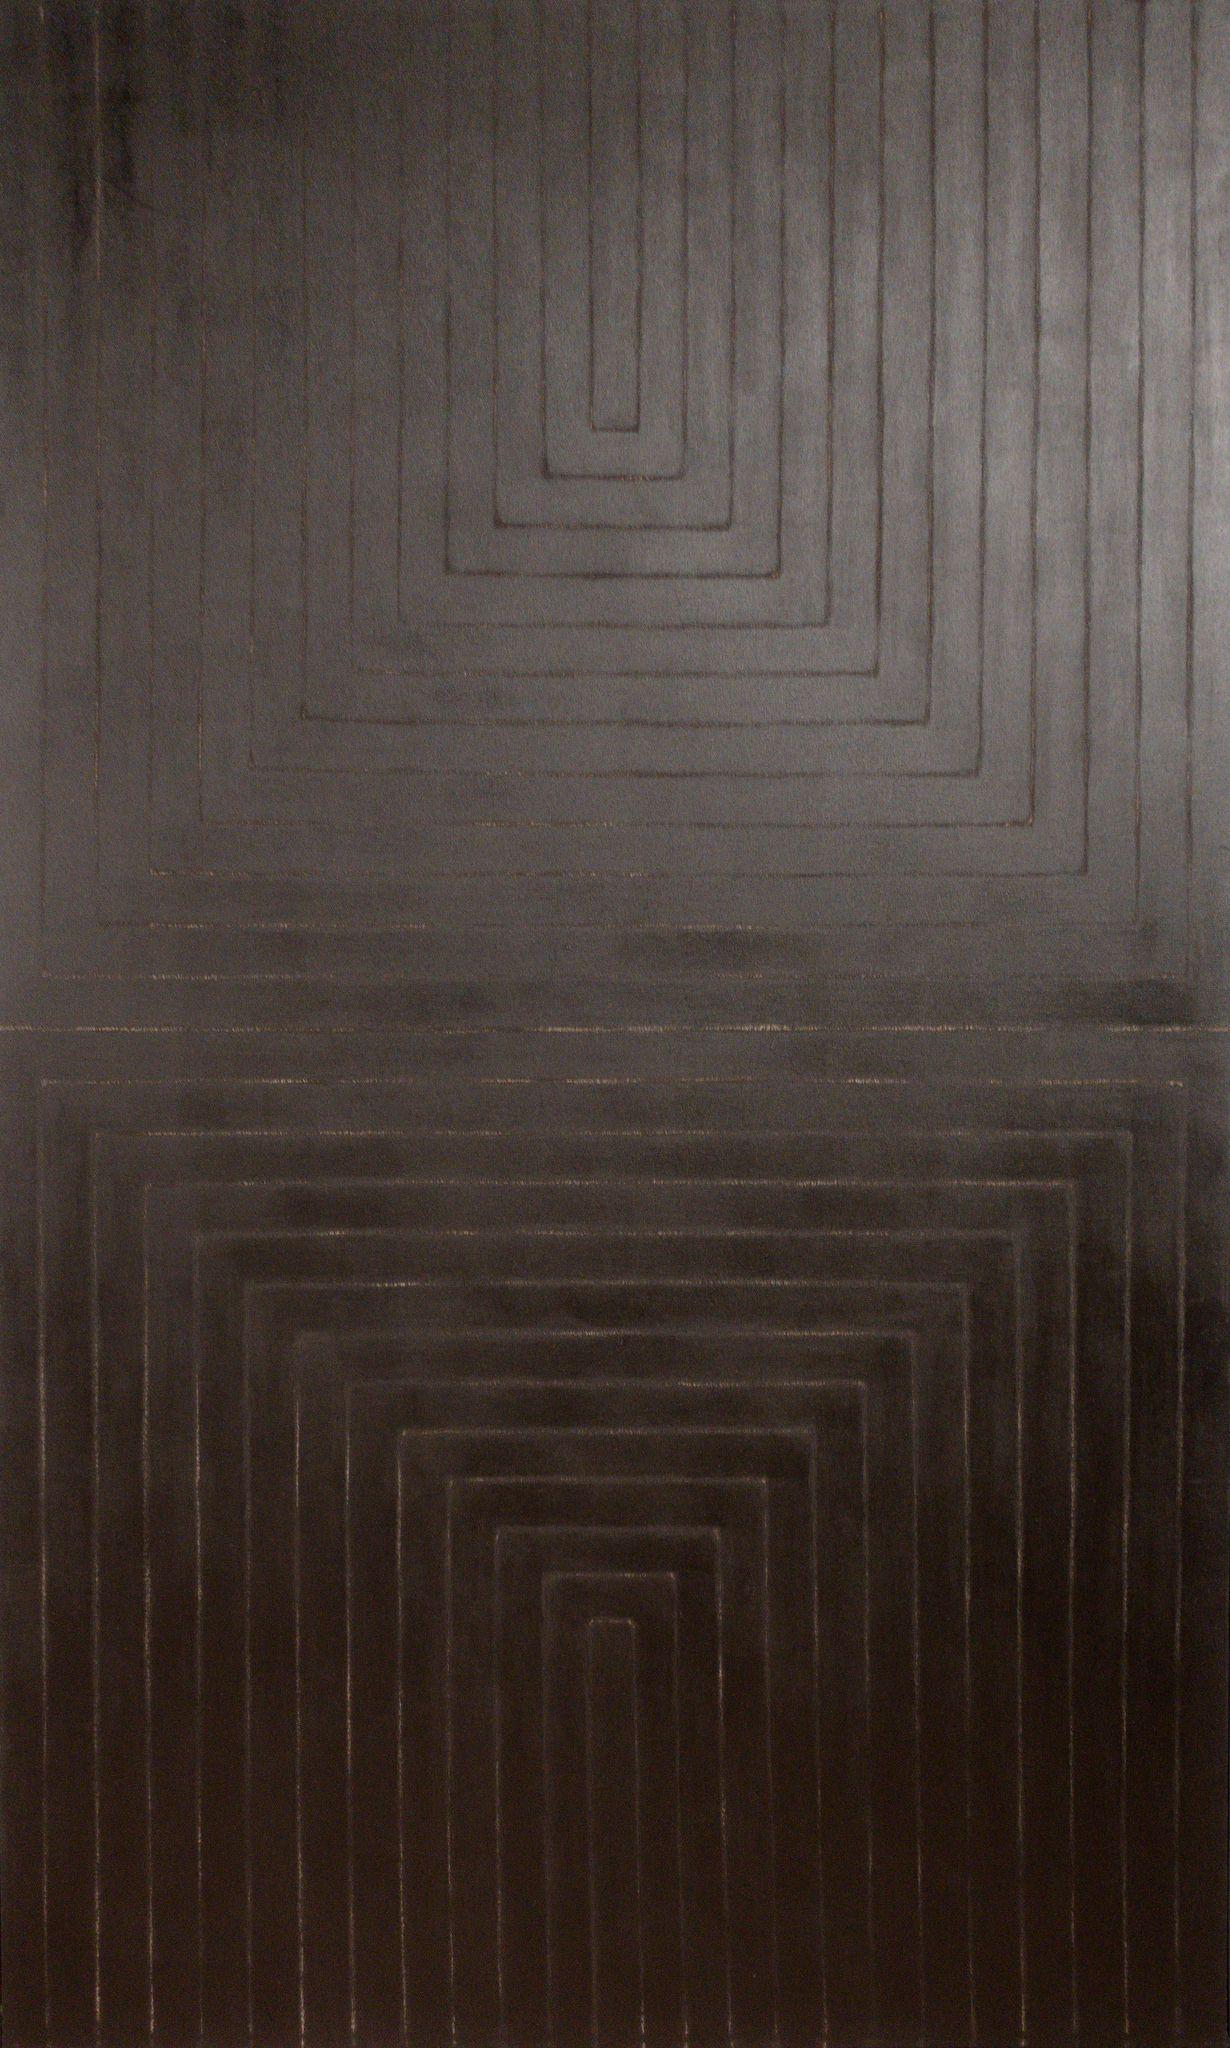 Frank Stella. Arundel Castle 1959